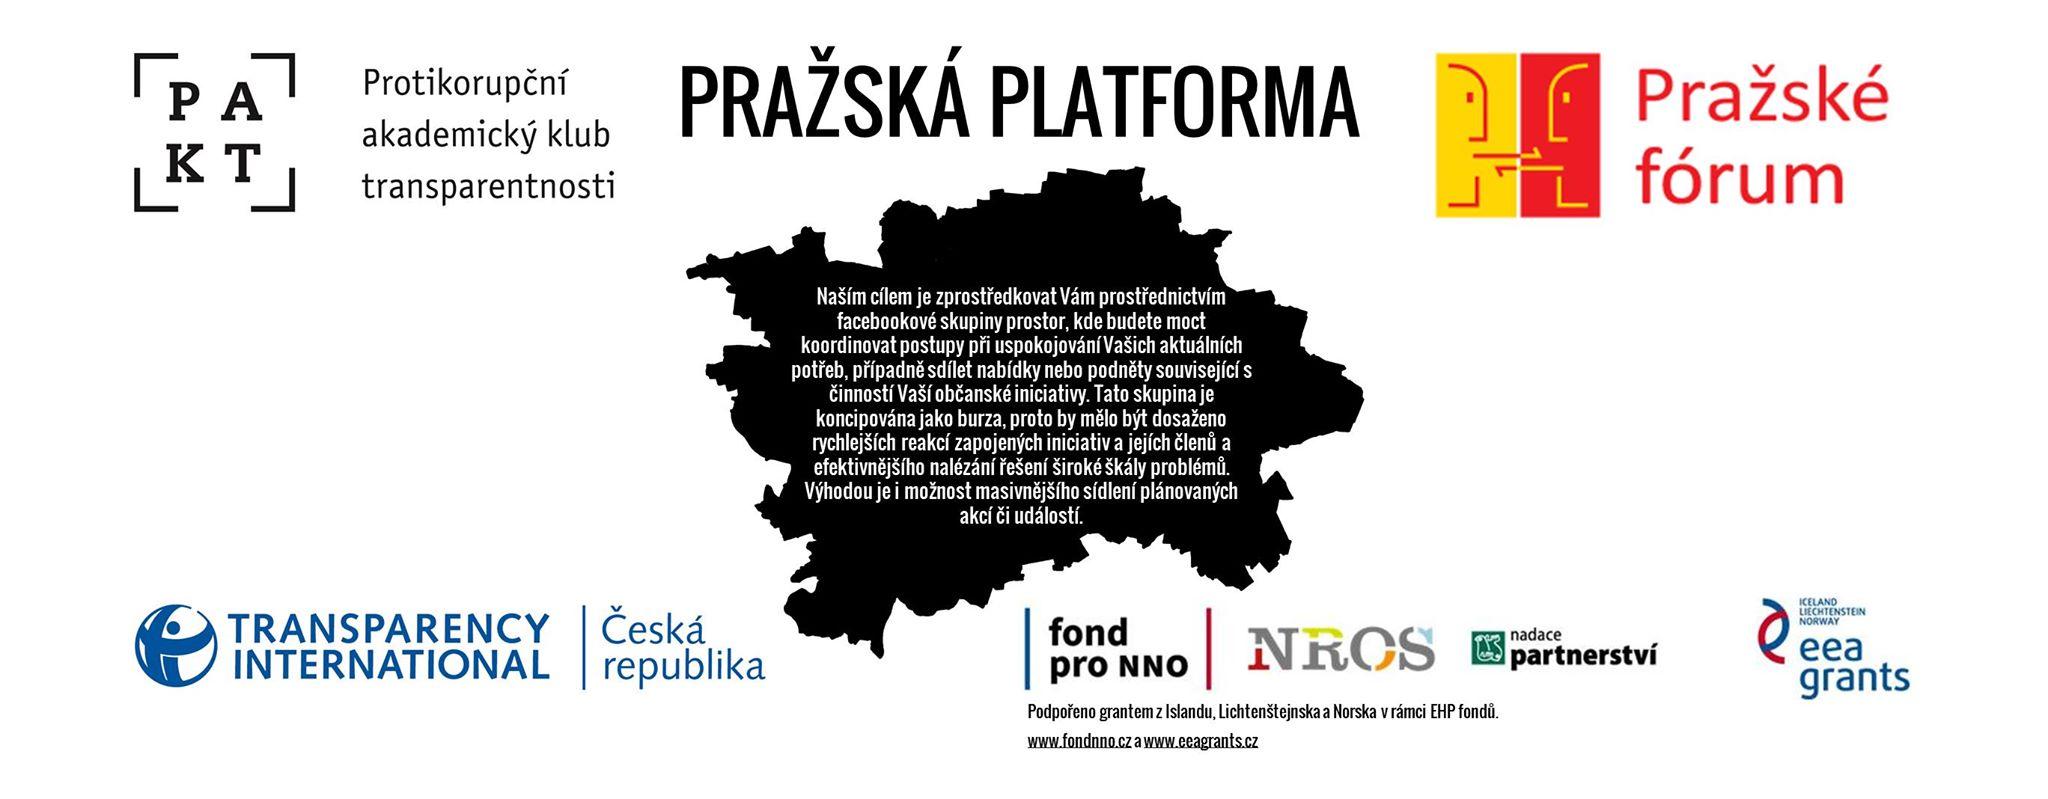 Pražská platforma - header